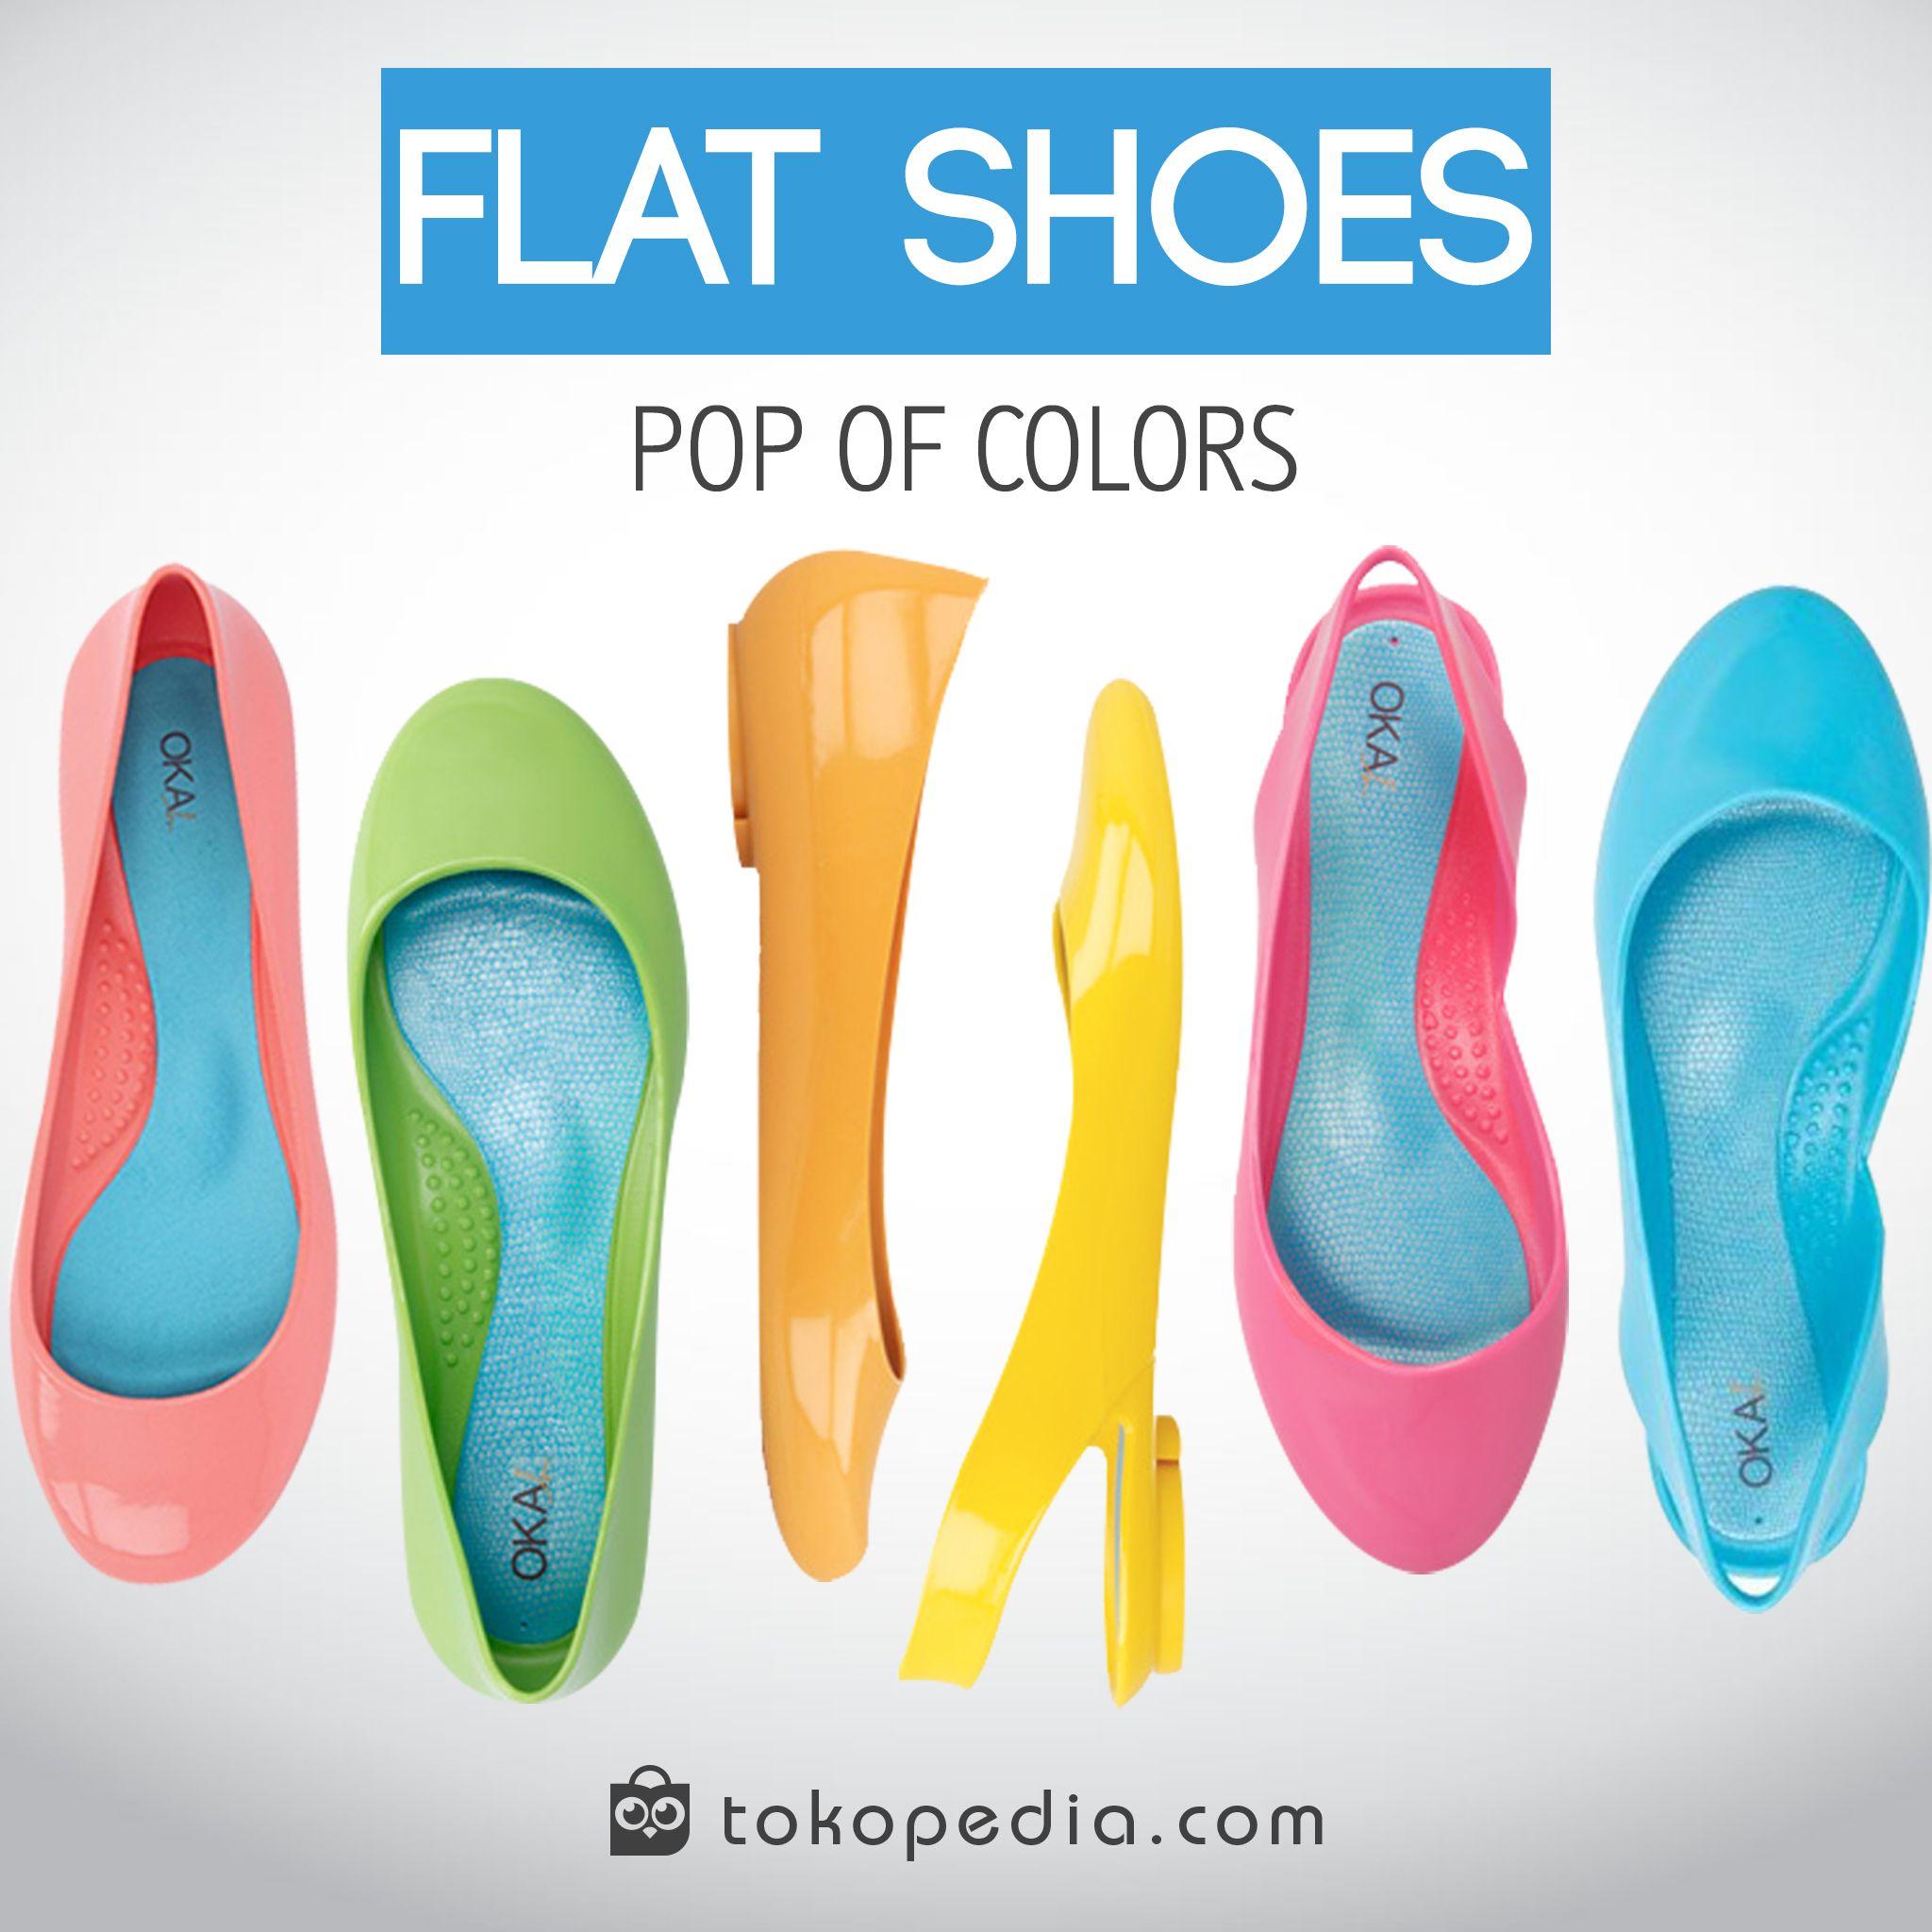 Pin By Tokopedia Official On Hot List Pinterest Flat Lady Jelly Shoes Sepatu Sendal Wanita Flats